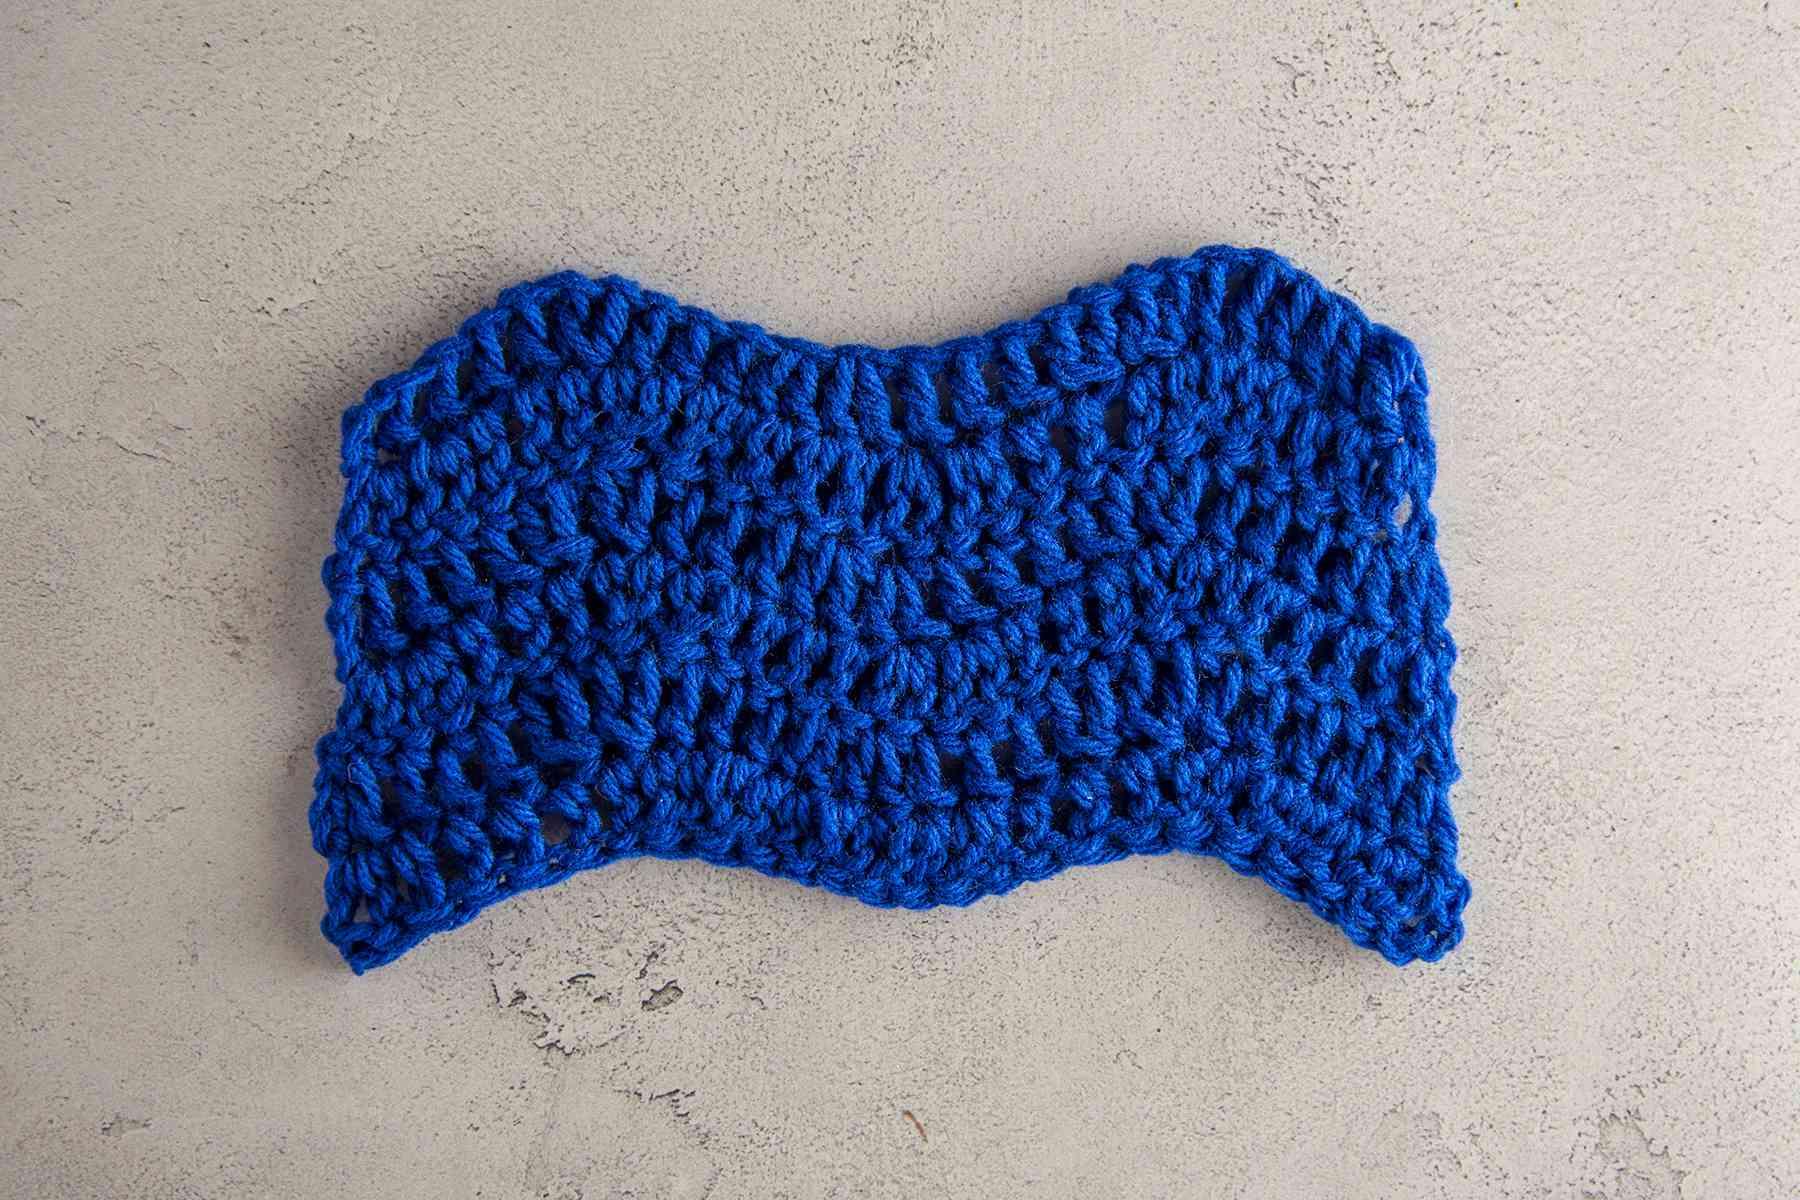 A crochet ripple stitch swatch